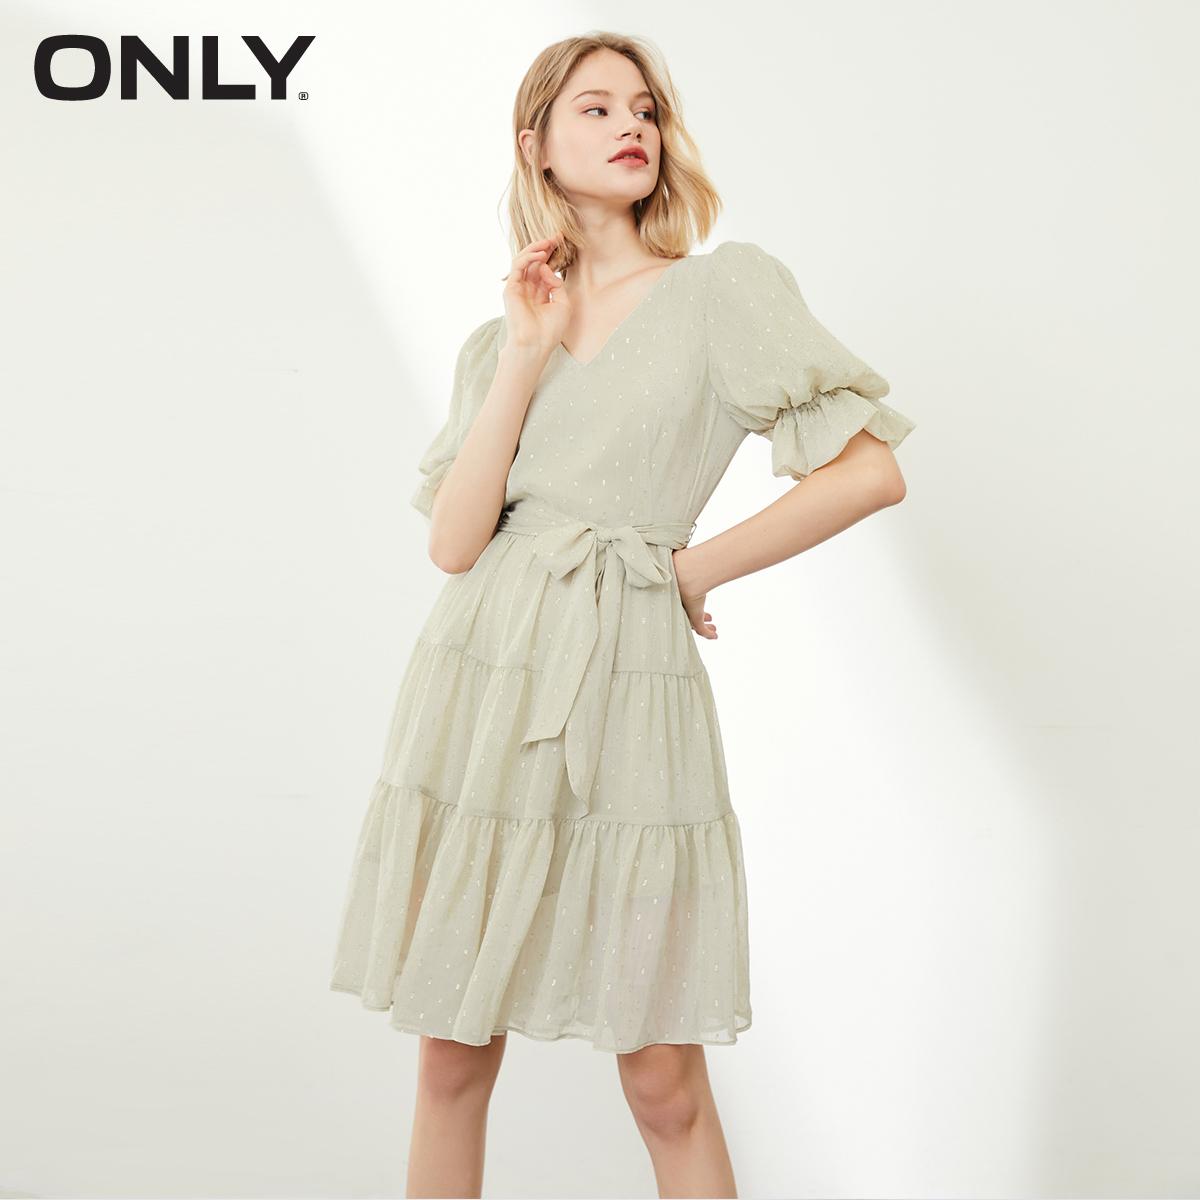 ONLY春季新款公主袖腰带装饰设计雪纺连衣裙女|120307020